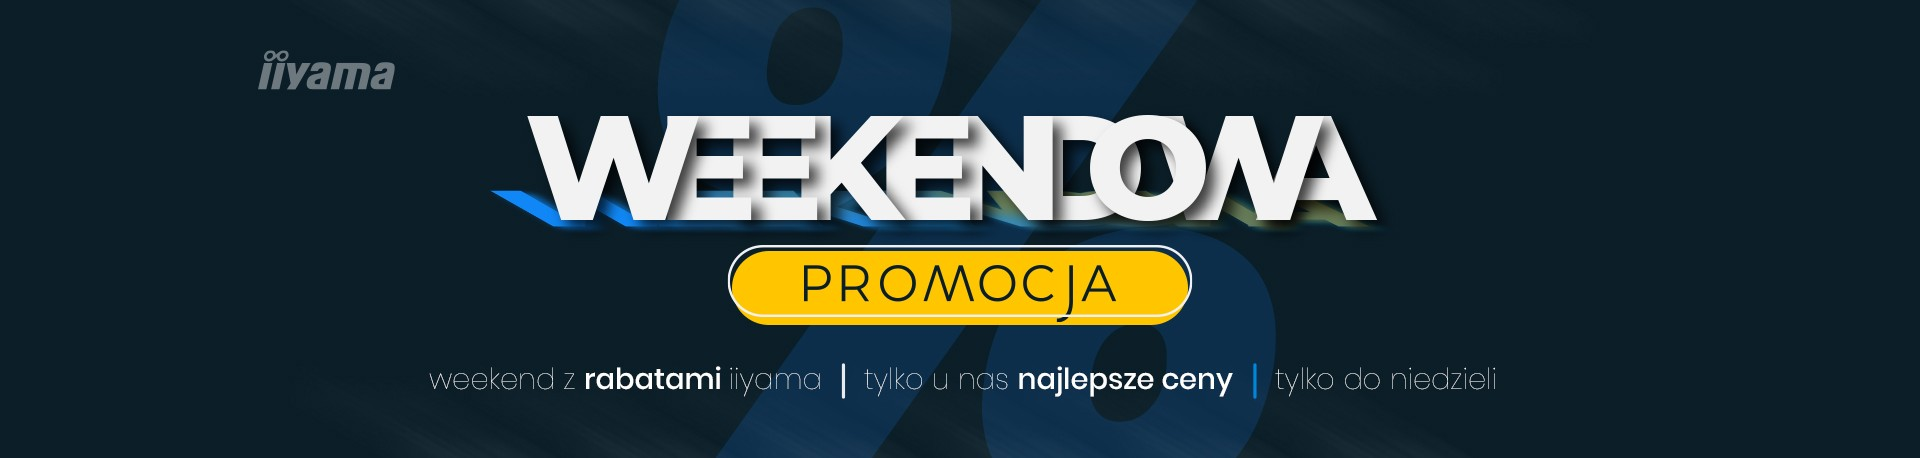 Weekendowa Promocja